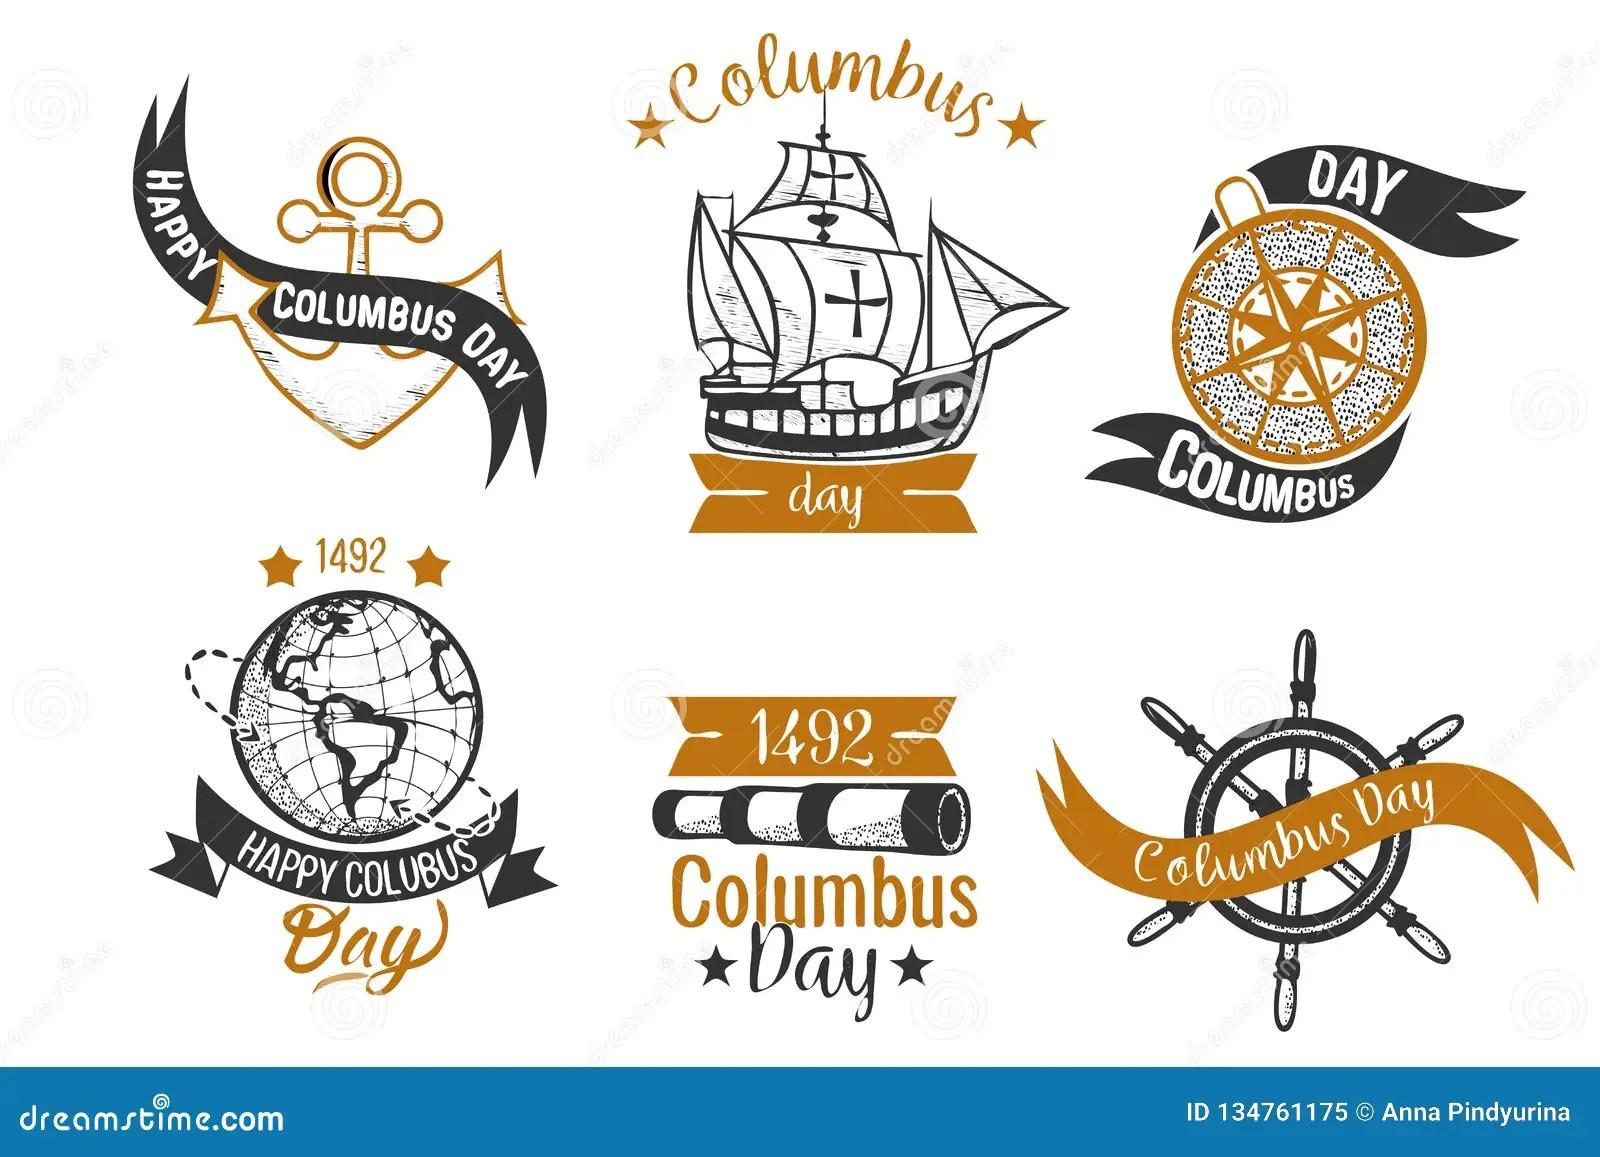 Best 50 Columbus Day Pics